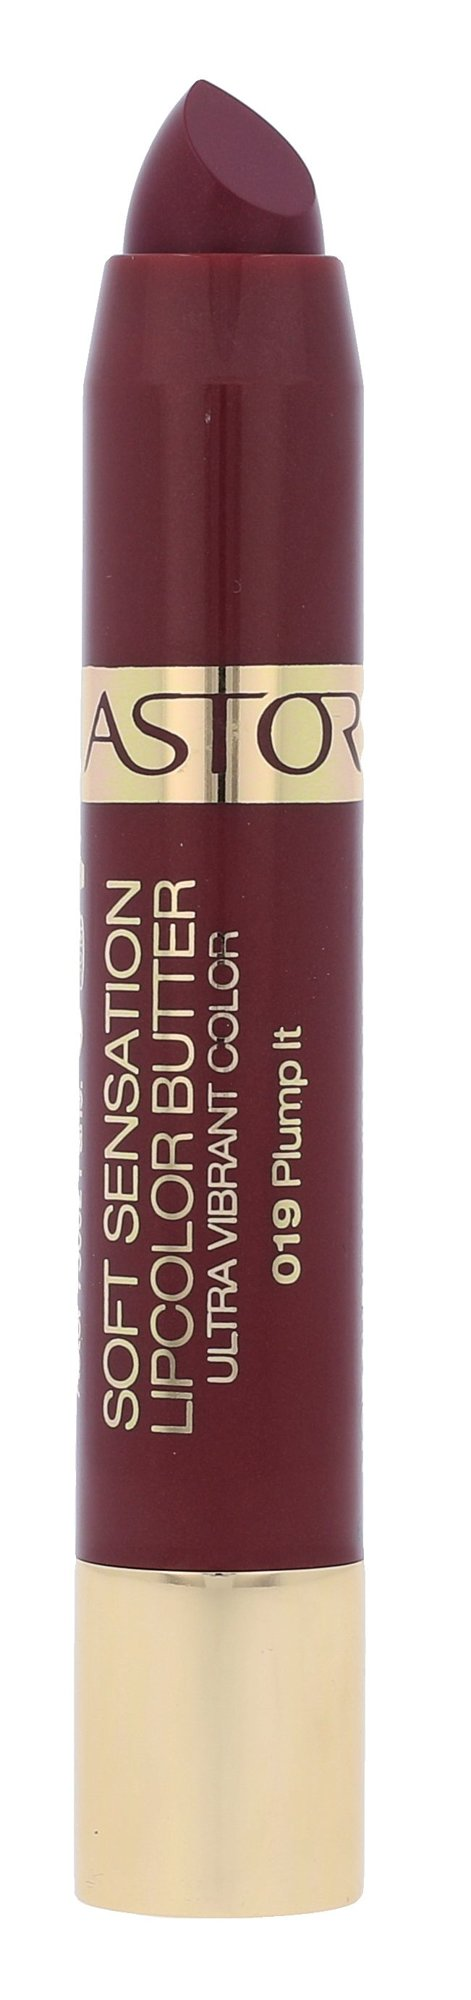 ASTOR Soft Sensation Cosmetic 4,8ml 019 Plump It